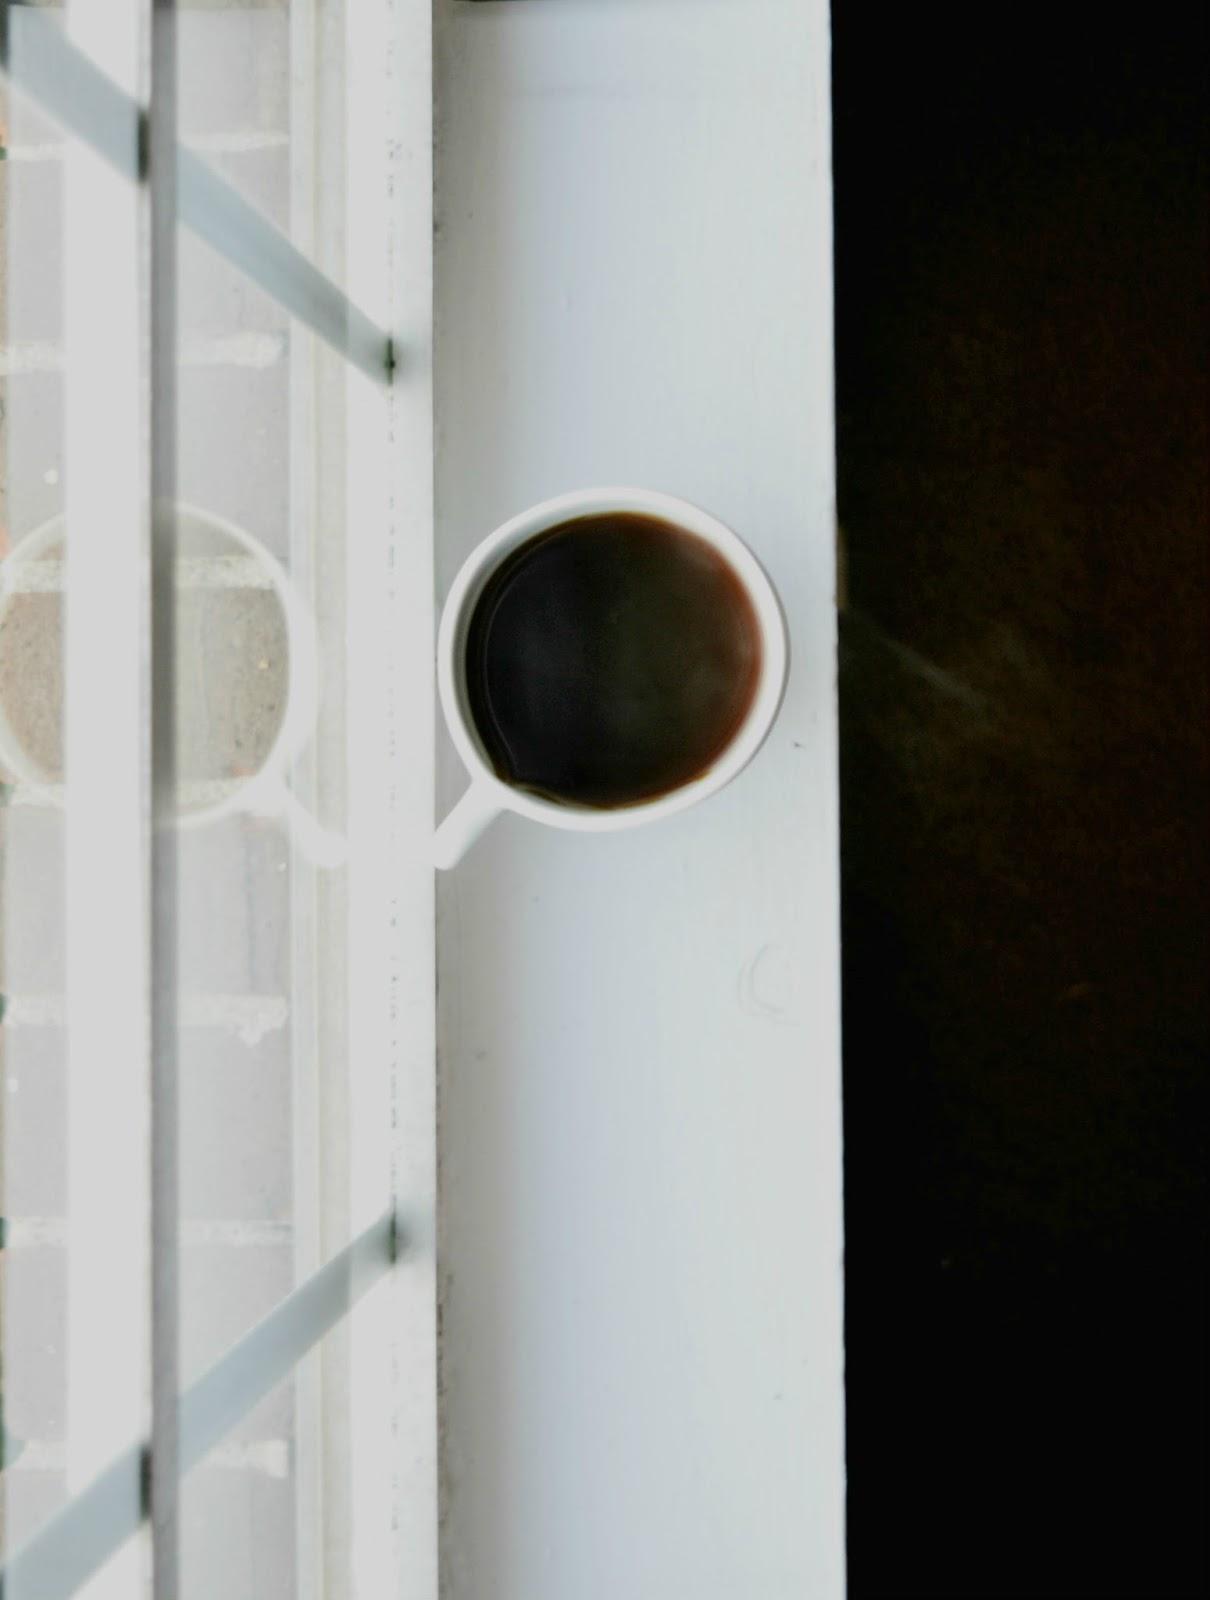 international coffee day, national coffee day, coffee photograph, celebrate national coffee day, celebrate international coffee day, quotes about coffee